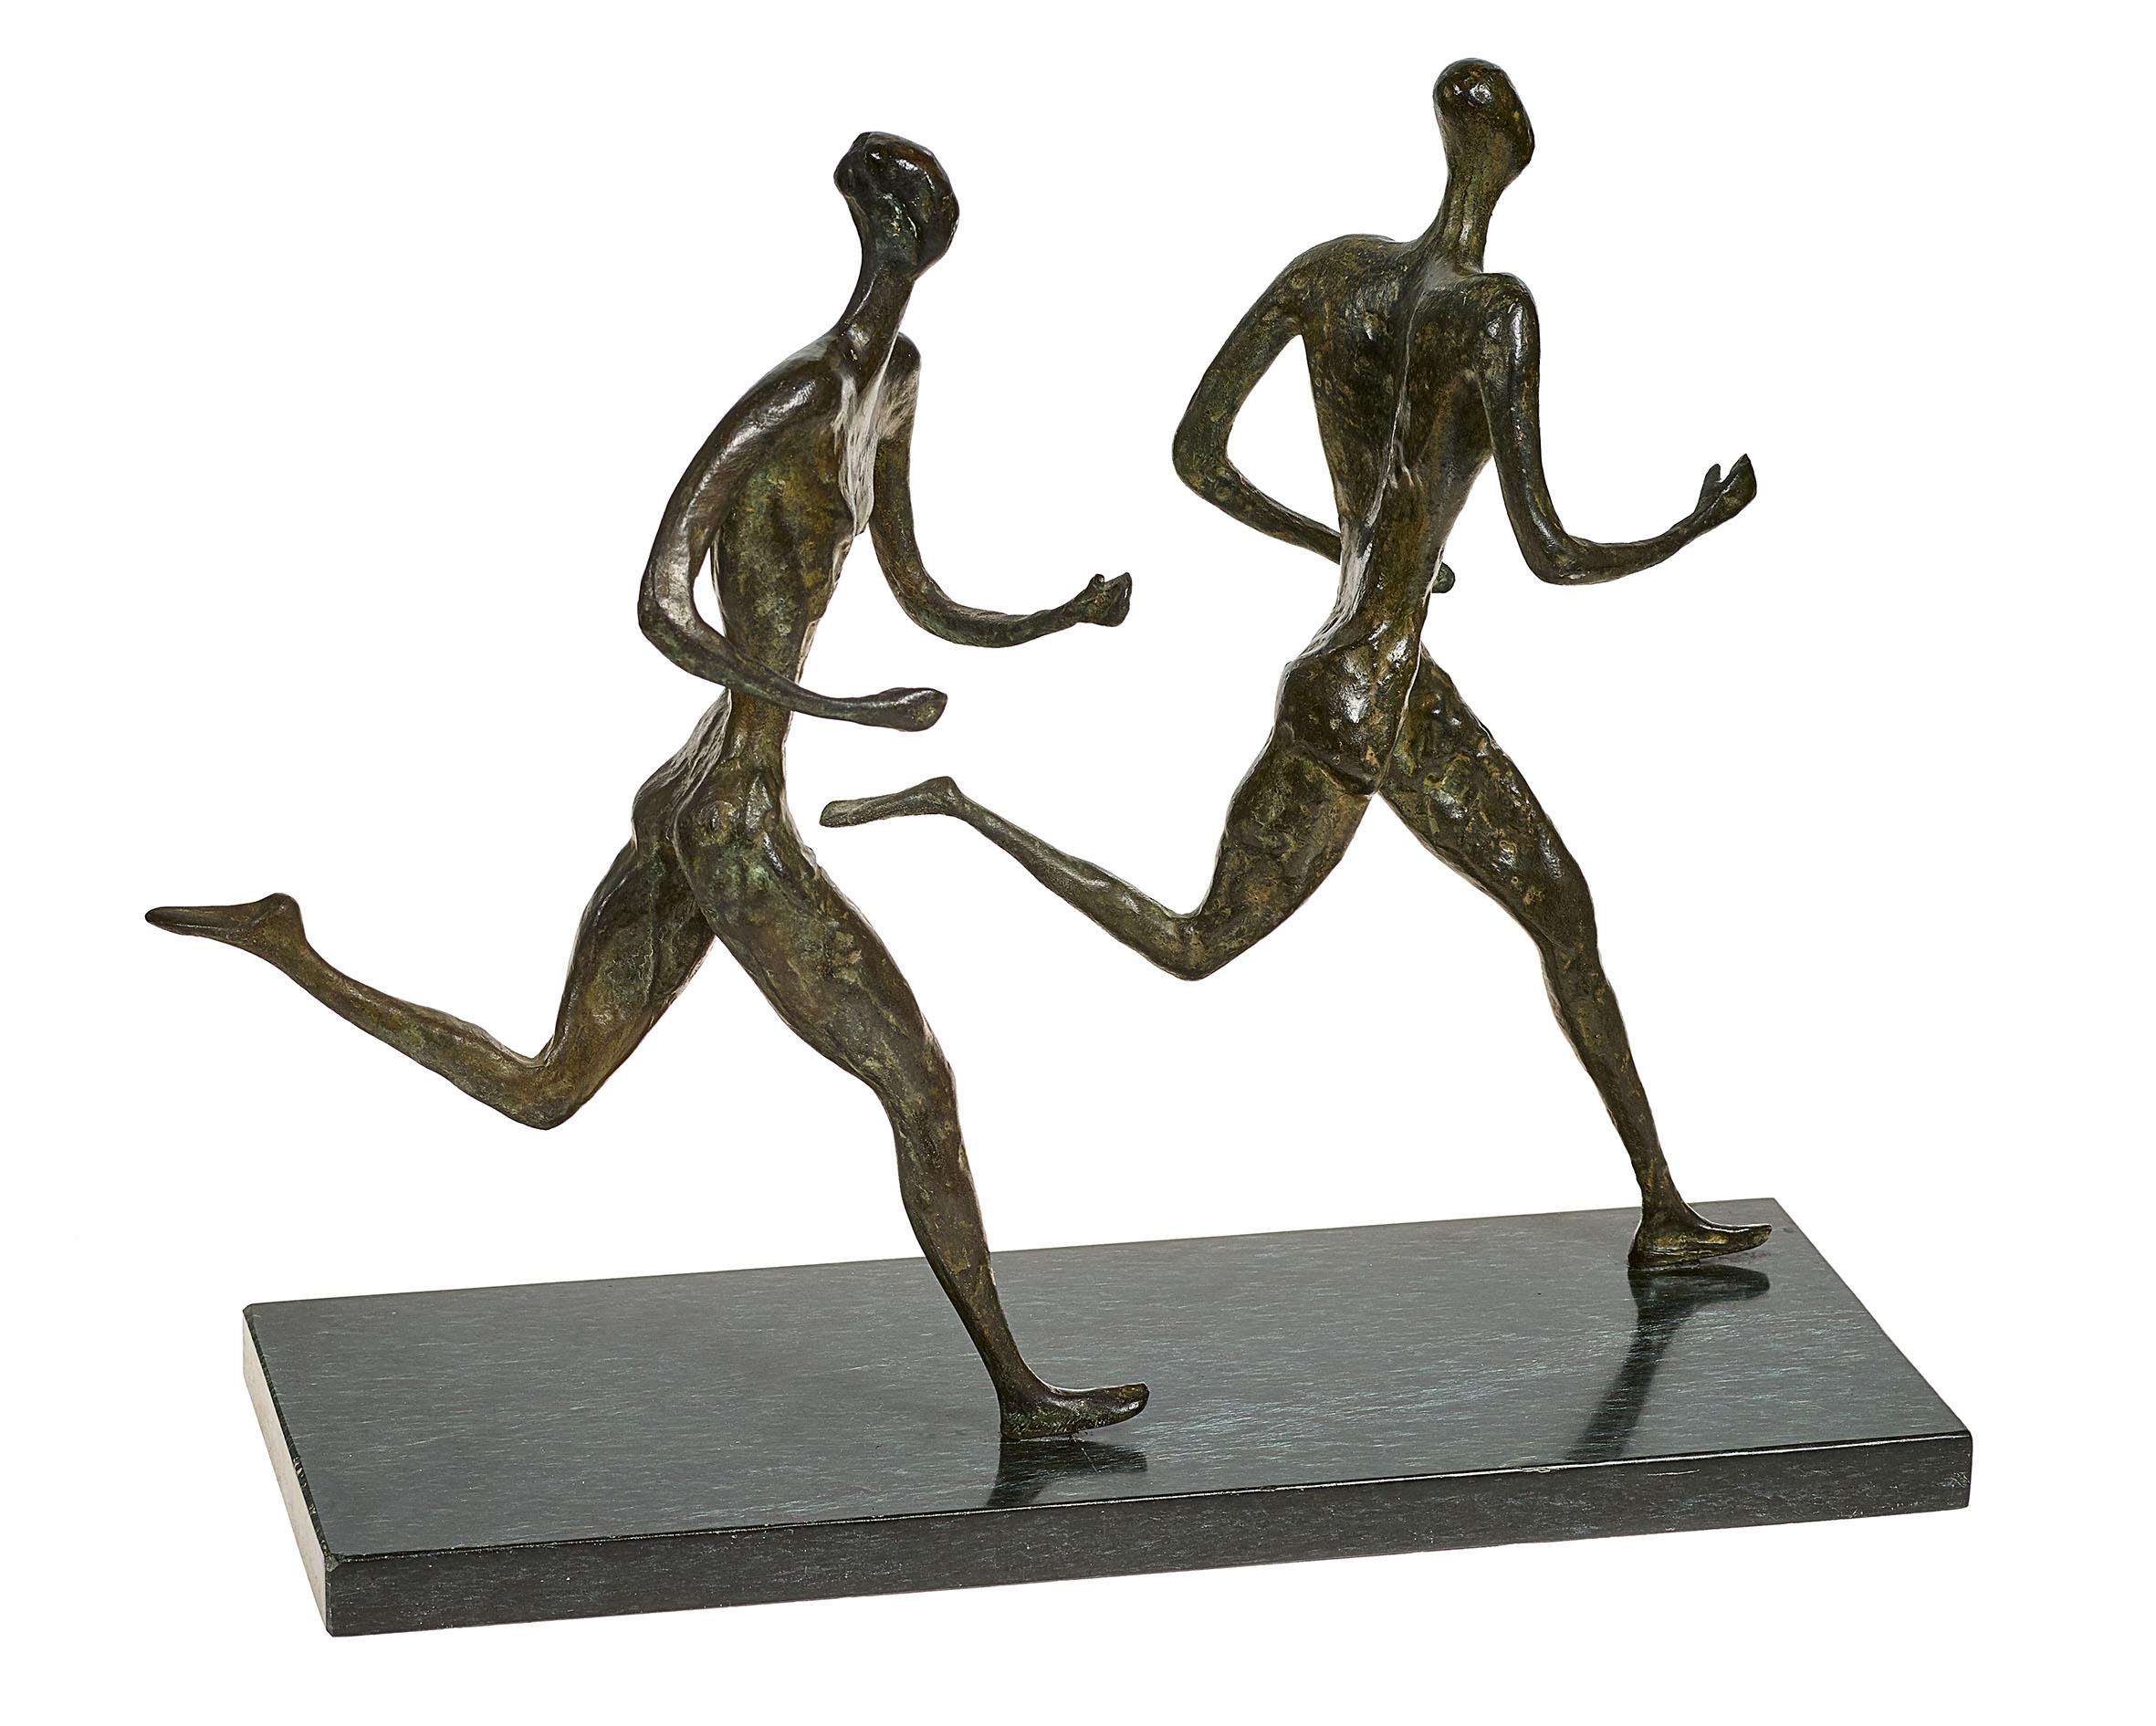 "Lot 59 - PERINCIOLI, MARCEL1911 Bern 2005Zwei Läufer.Bronze, patiniert,a. Plinthe sig. ""Perincioli"", dat. ("